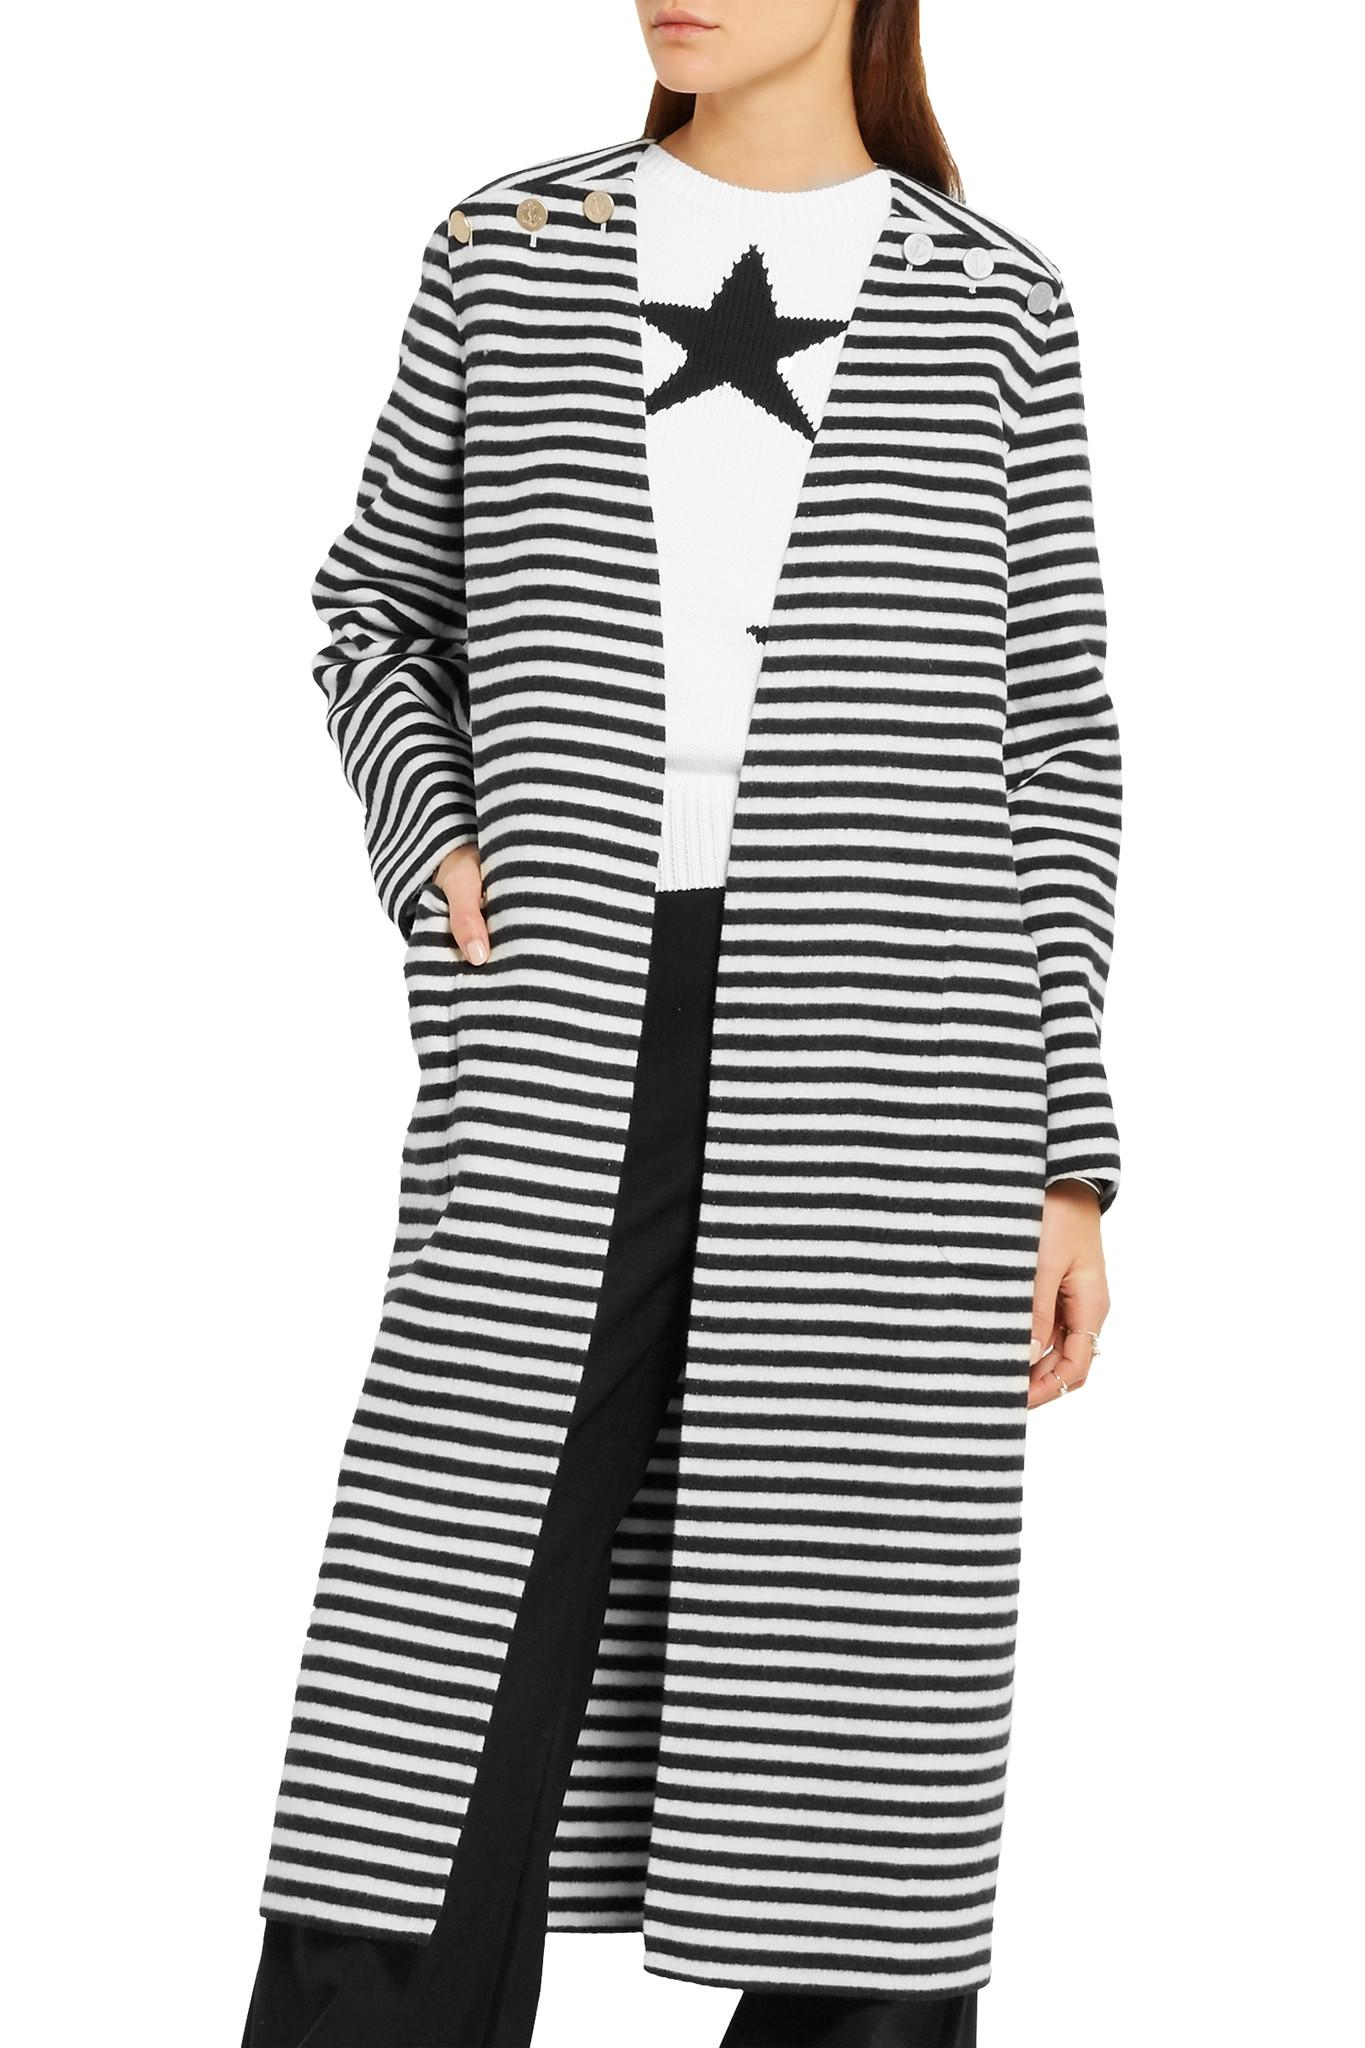 Max Mara Striped Wool & Angora Blend Coat